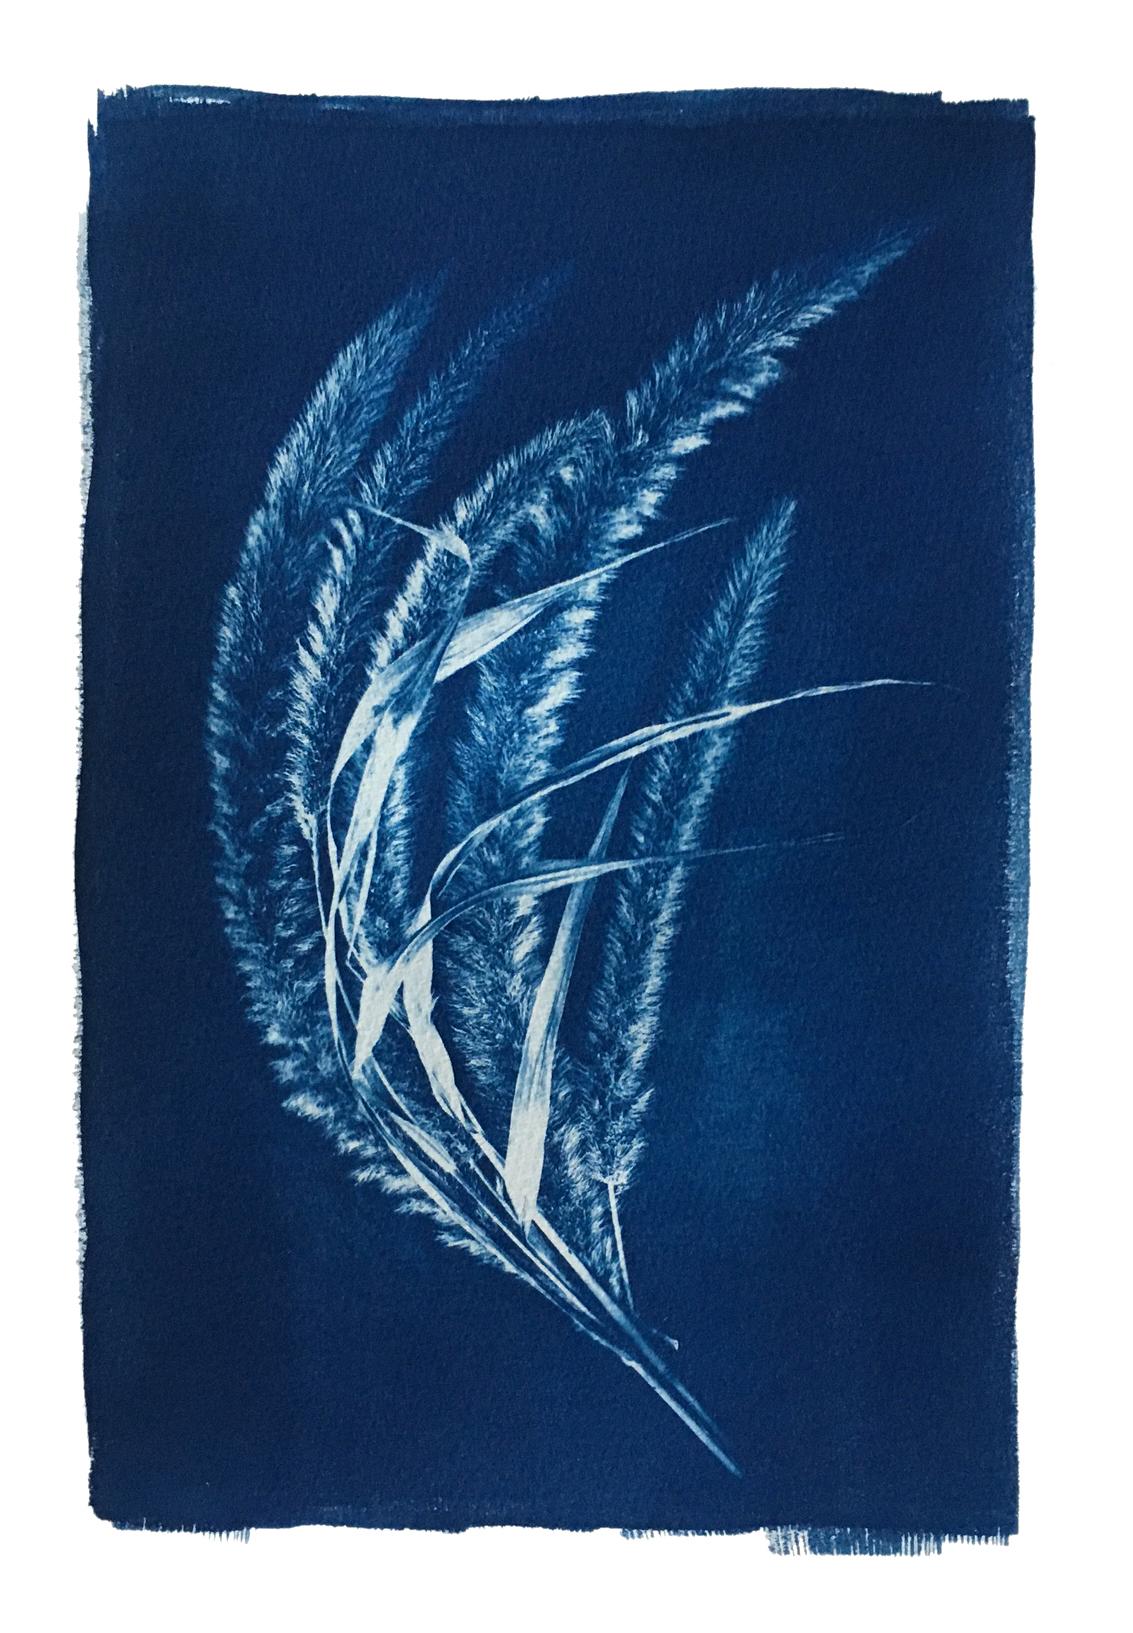 "TITLE /  Bristlegrass Fan  MEDIUM /  Cyanotype Print, Printed on 100% Cotton Paper  SIZE /  10"" x 14""  PRICE /  $375.00"